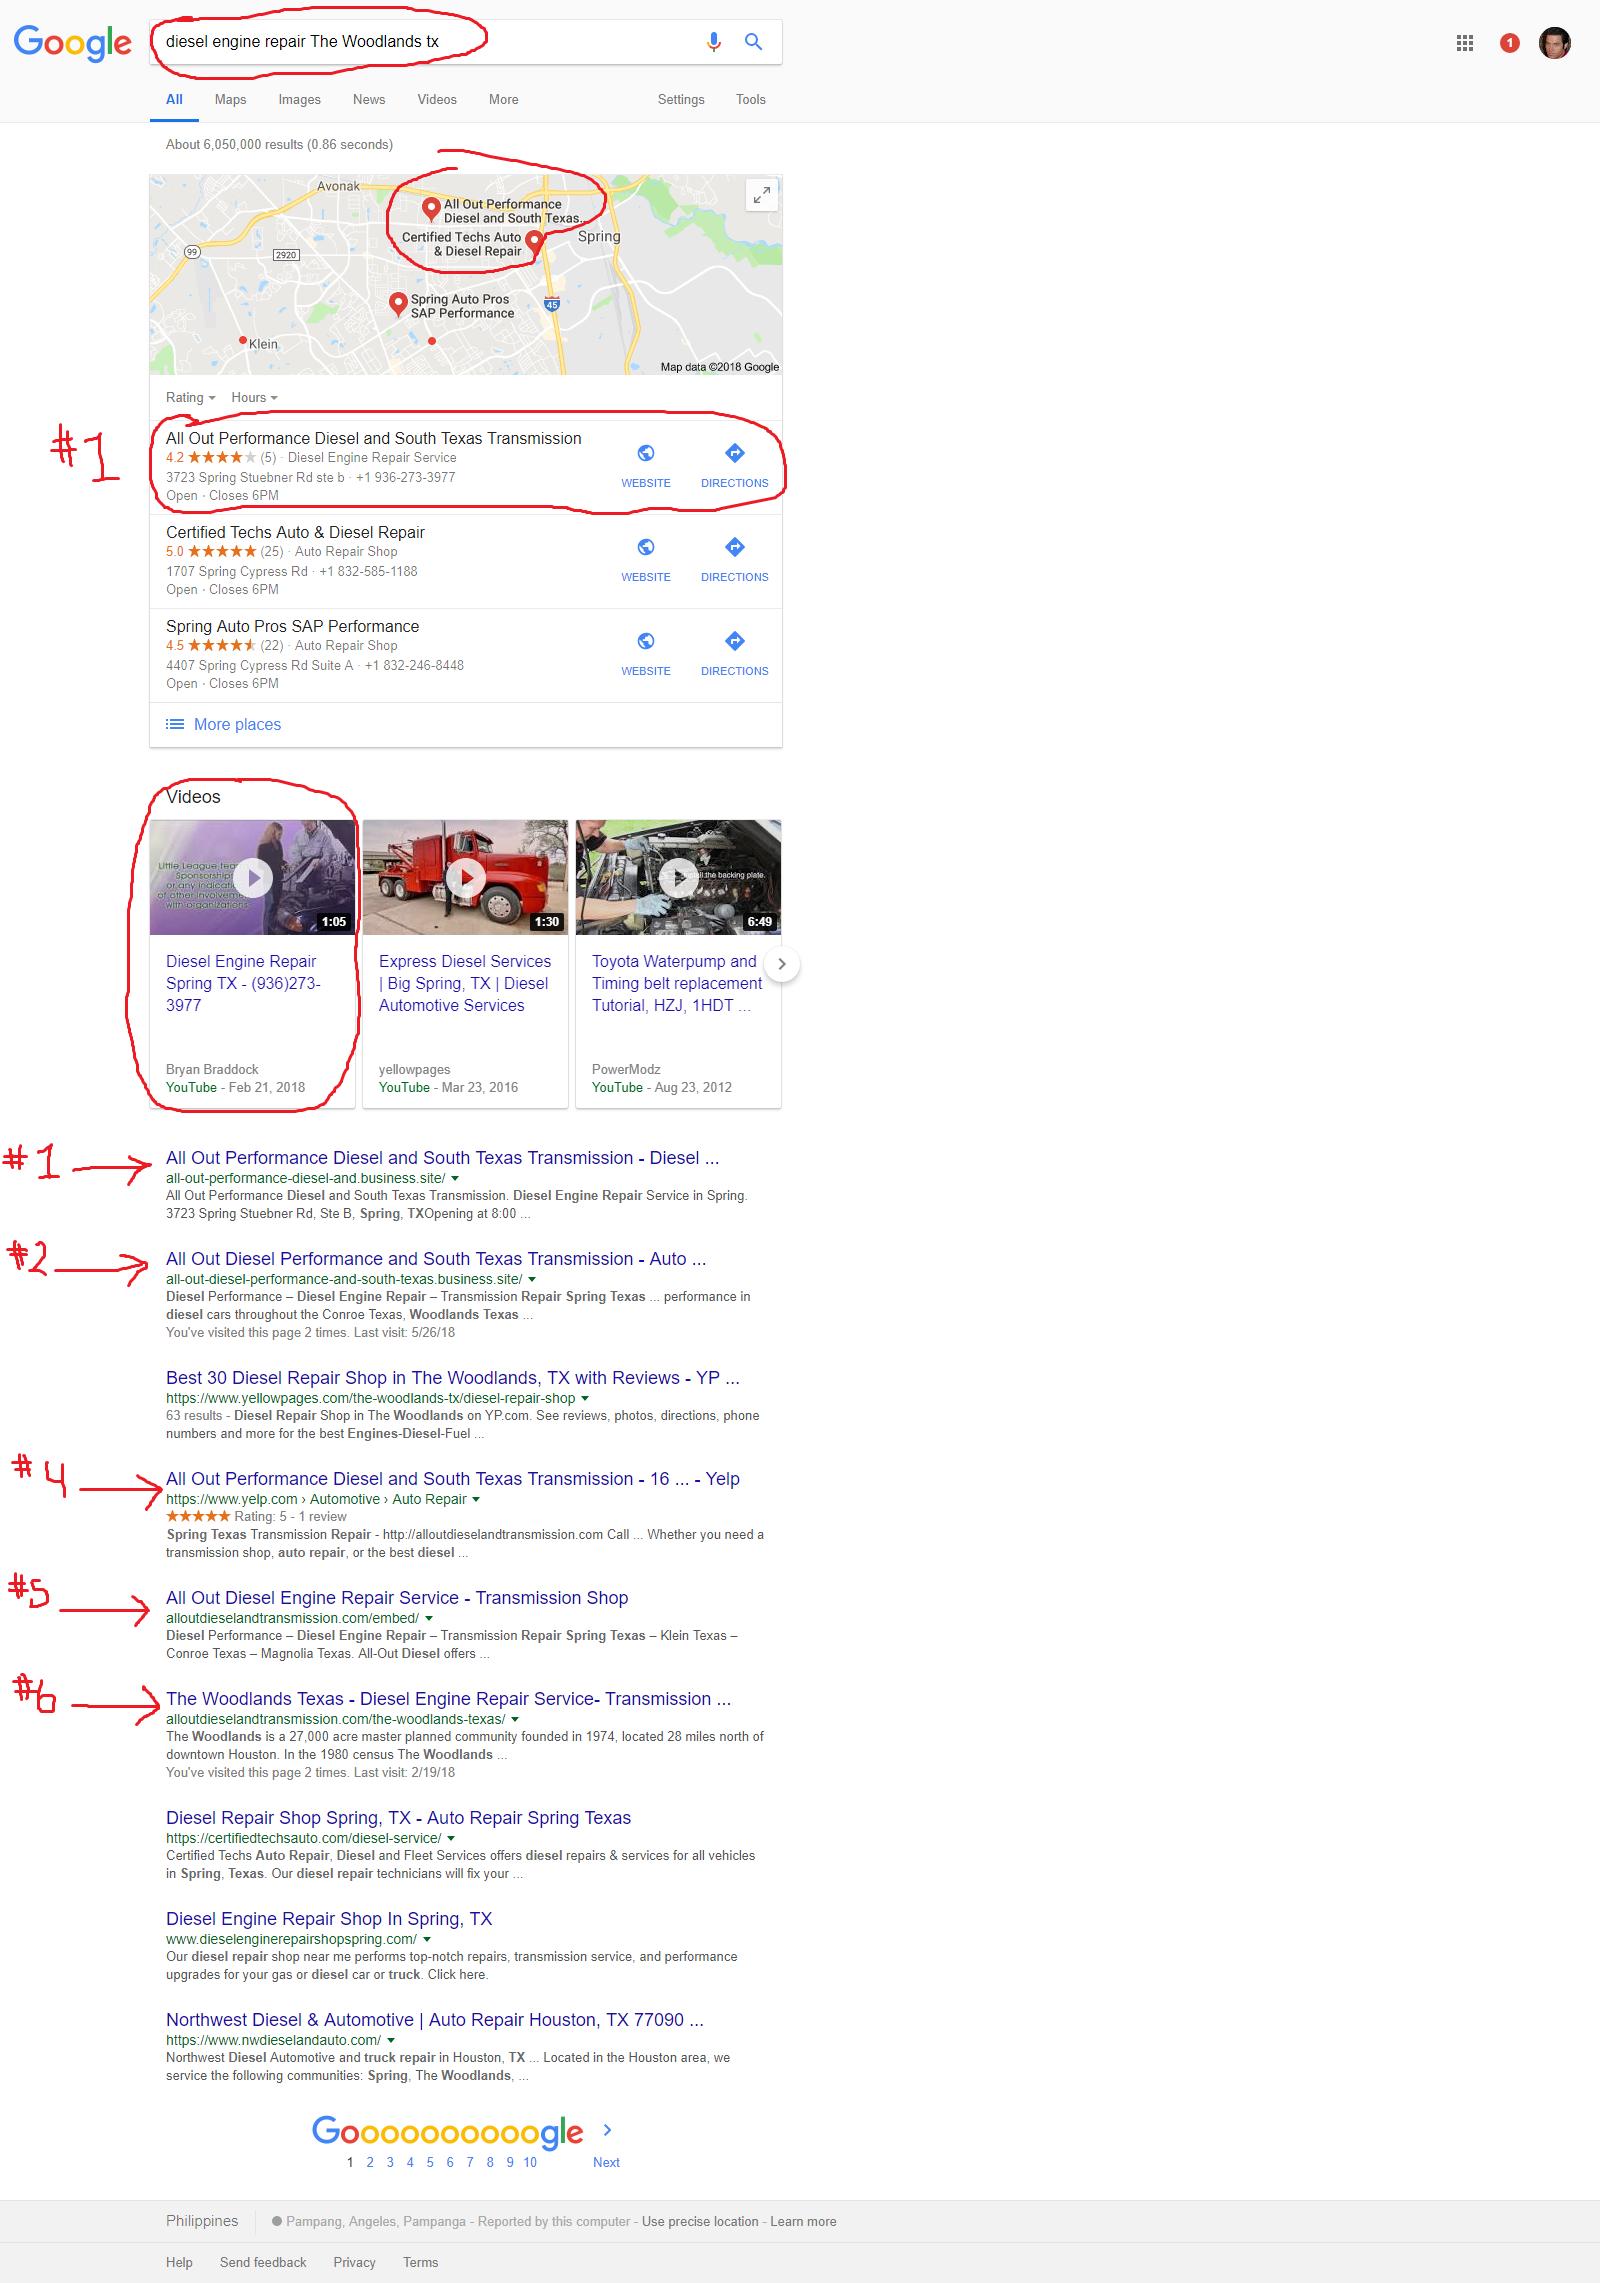 White Label - Local SEO Google 3 Pack Ranking